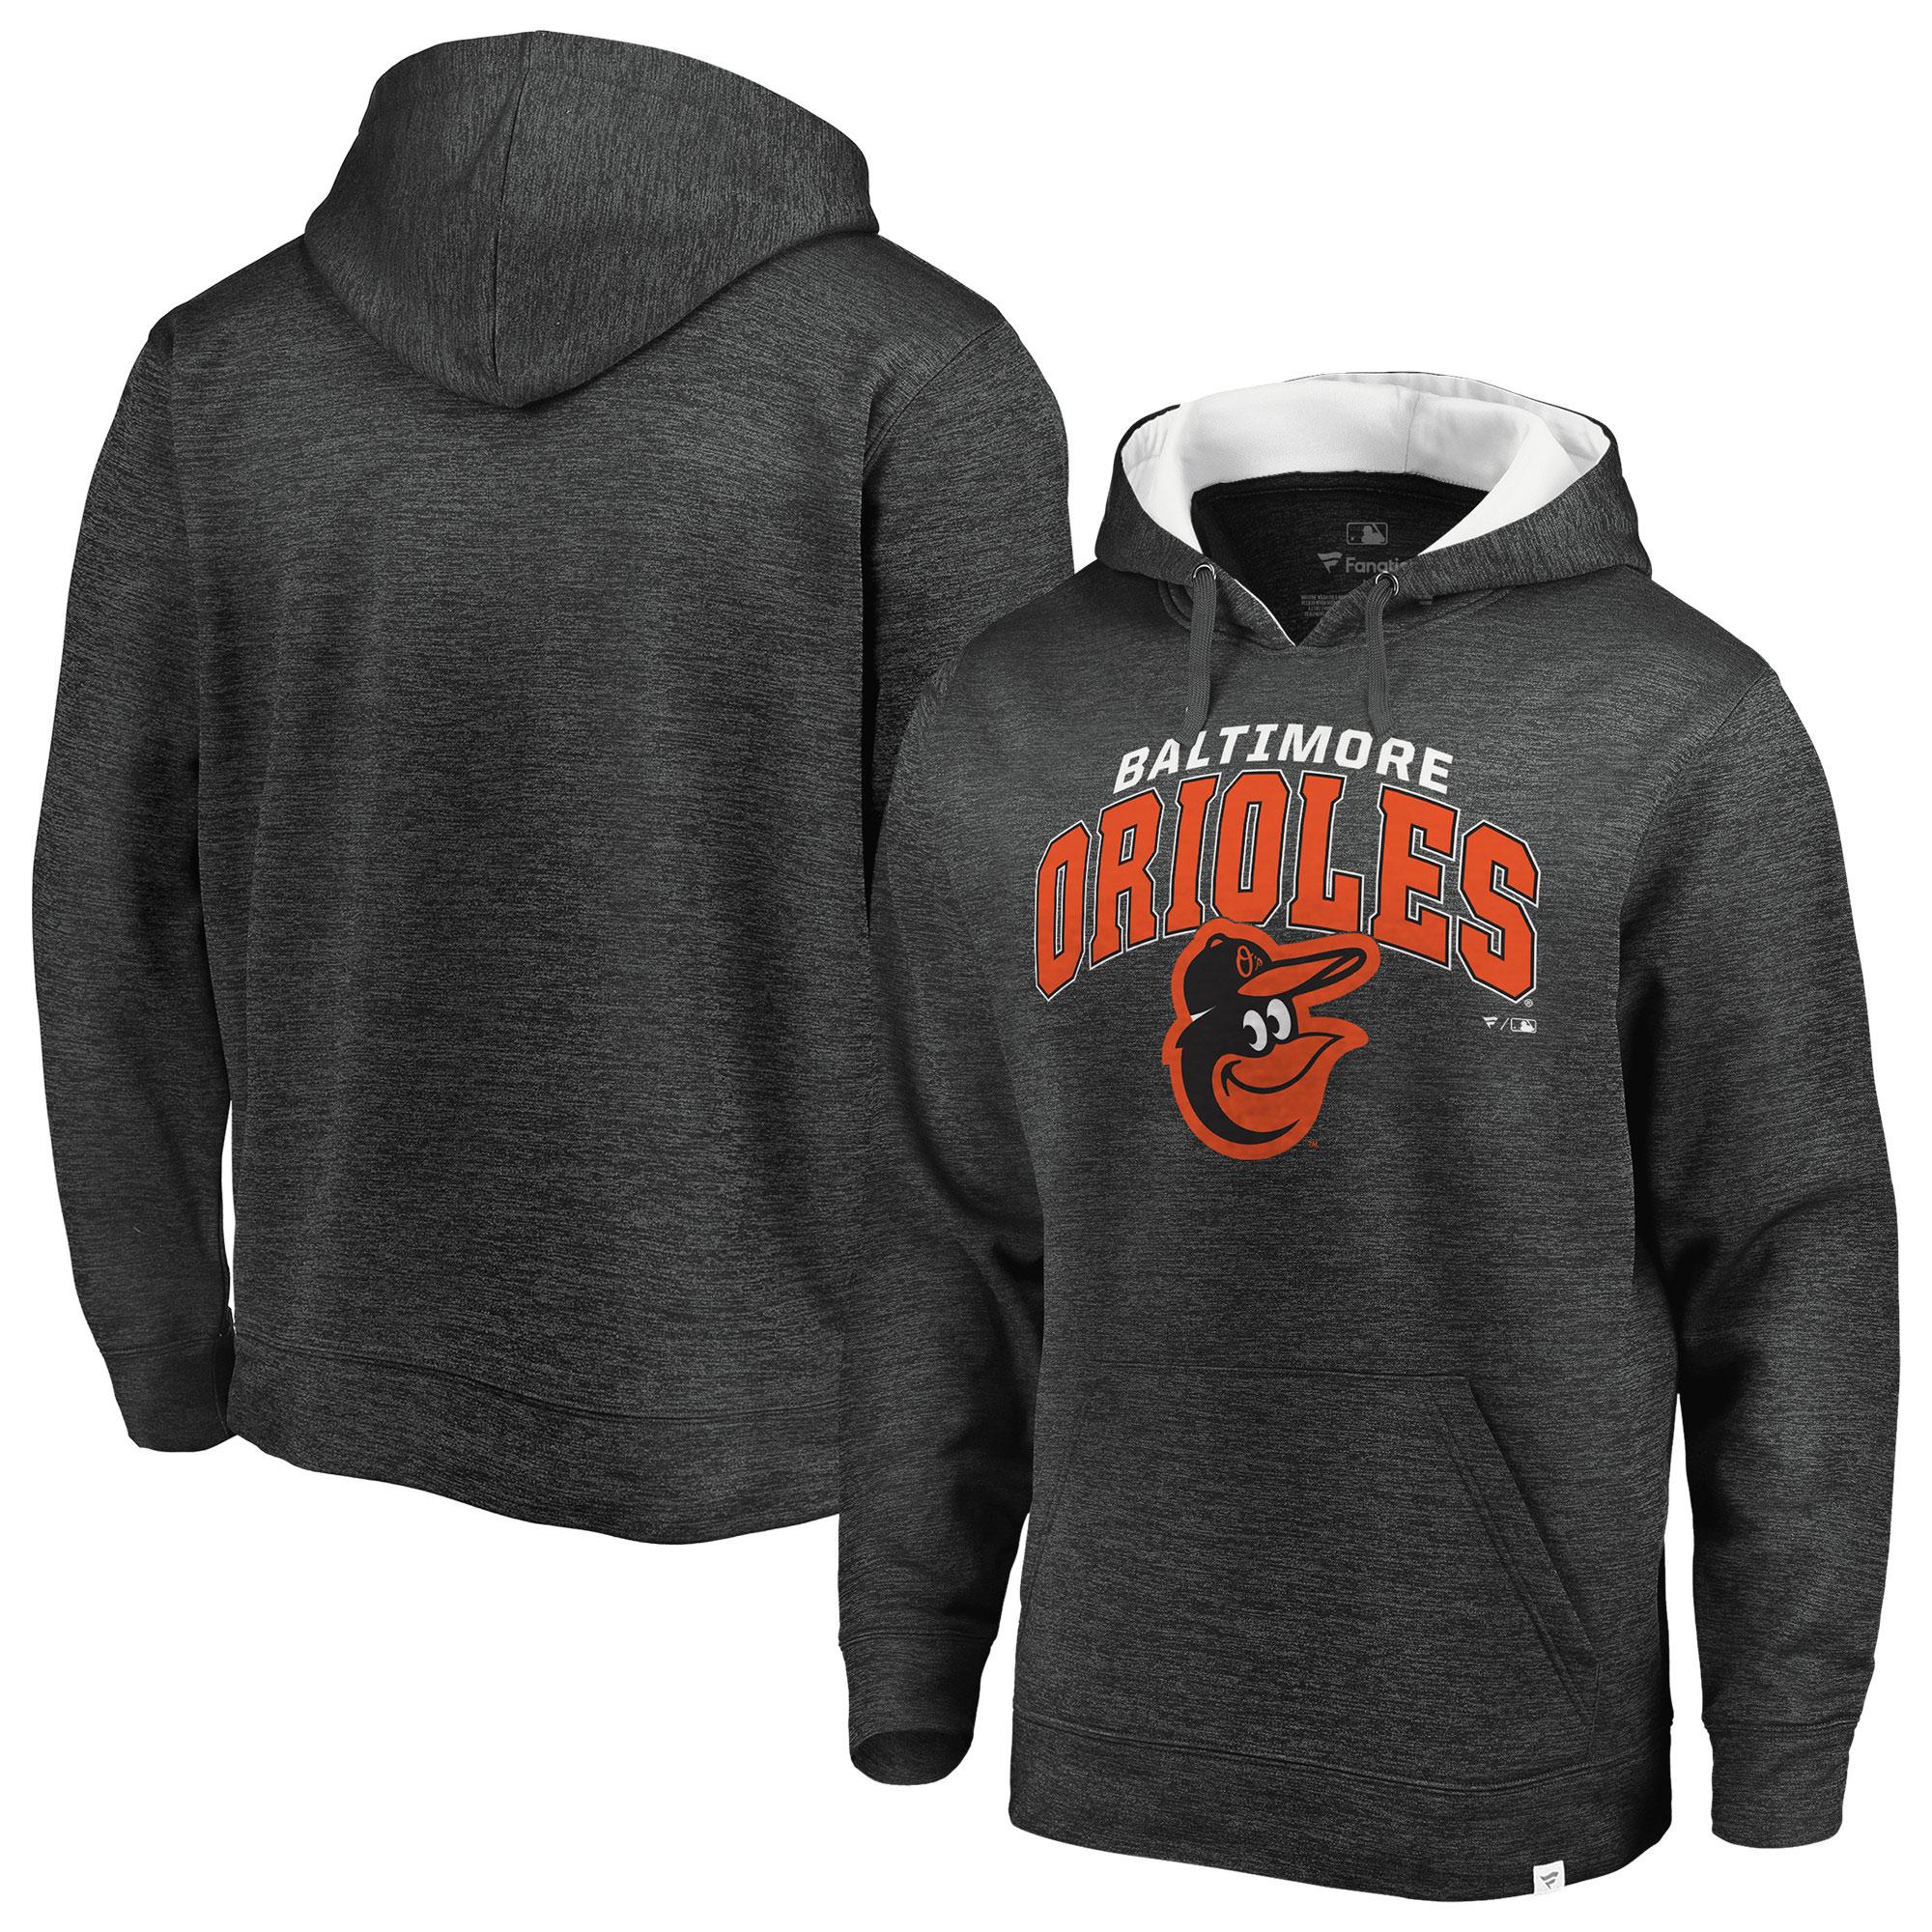 Baltimore Orioles Fanatics Branded Steady Fleece Pullover Hoodie - Gray